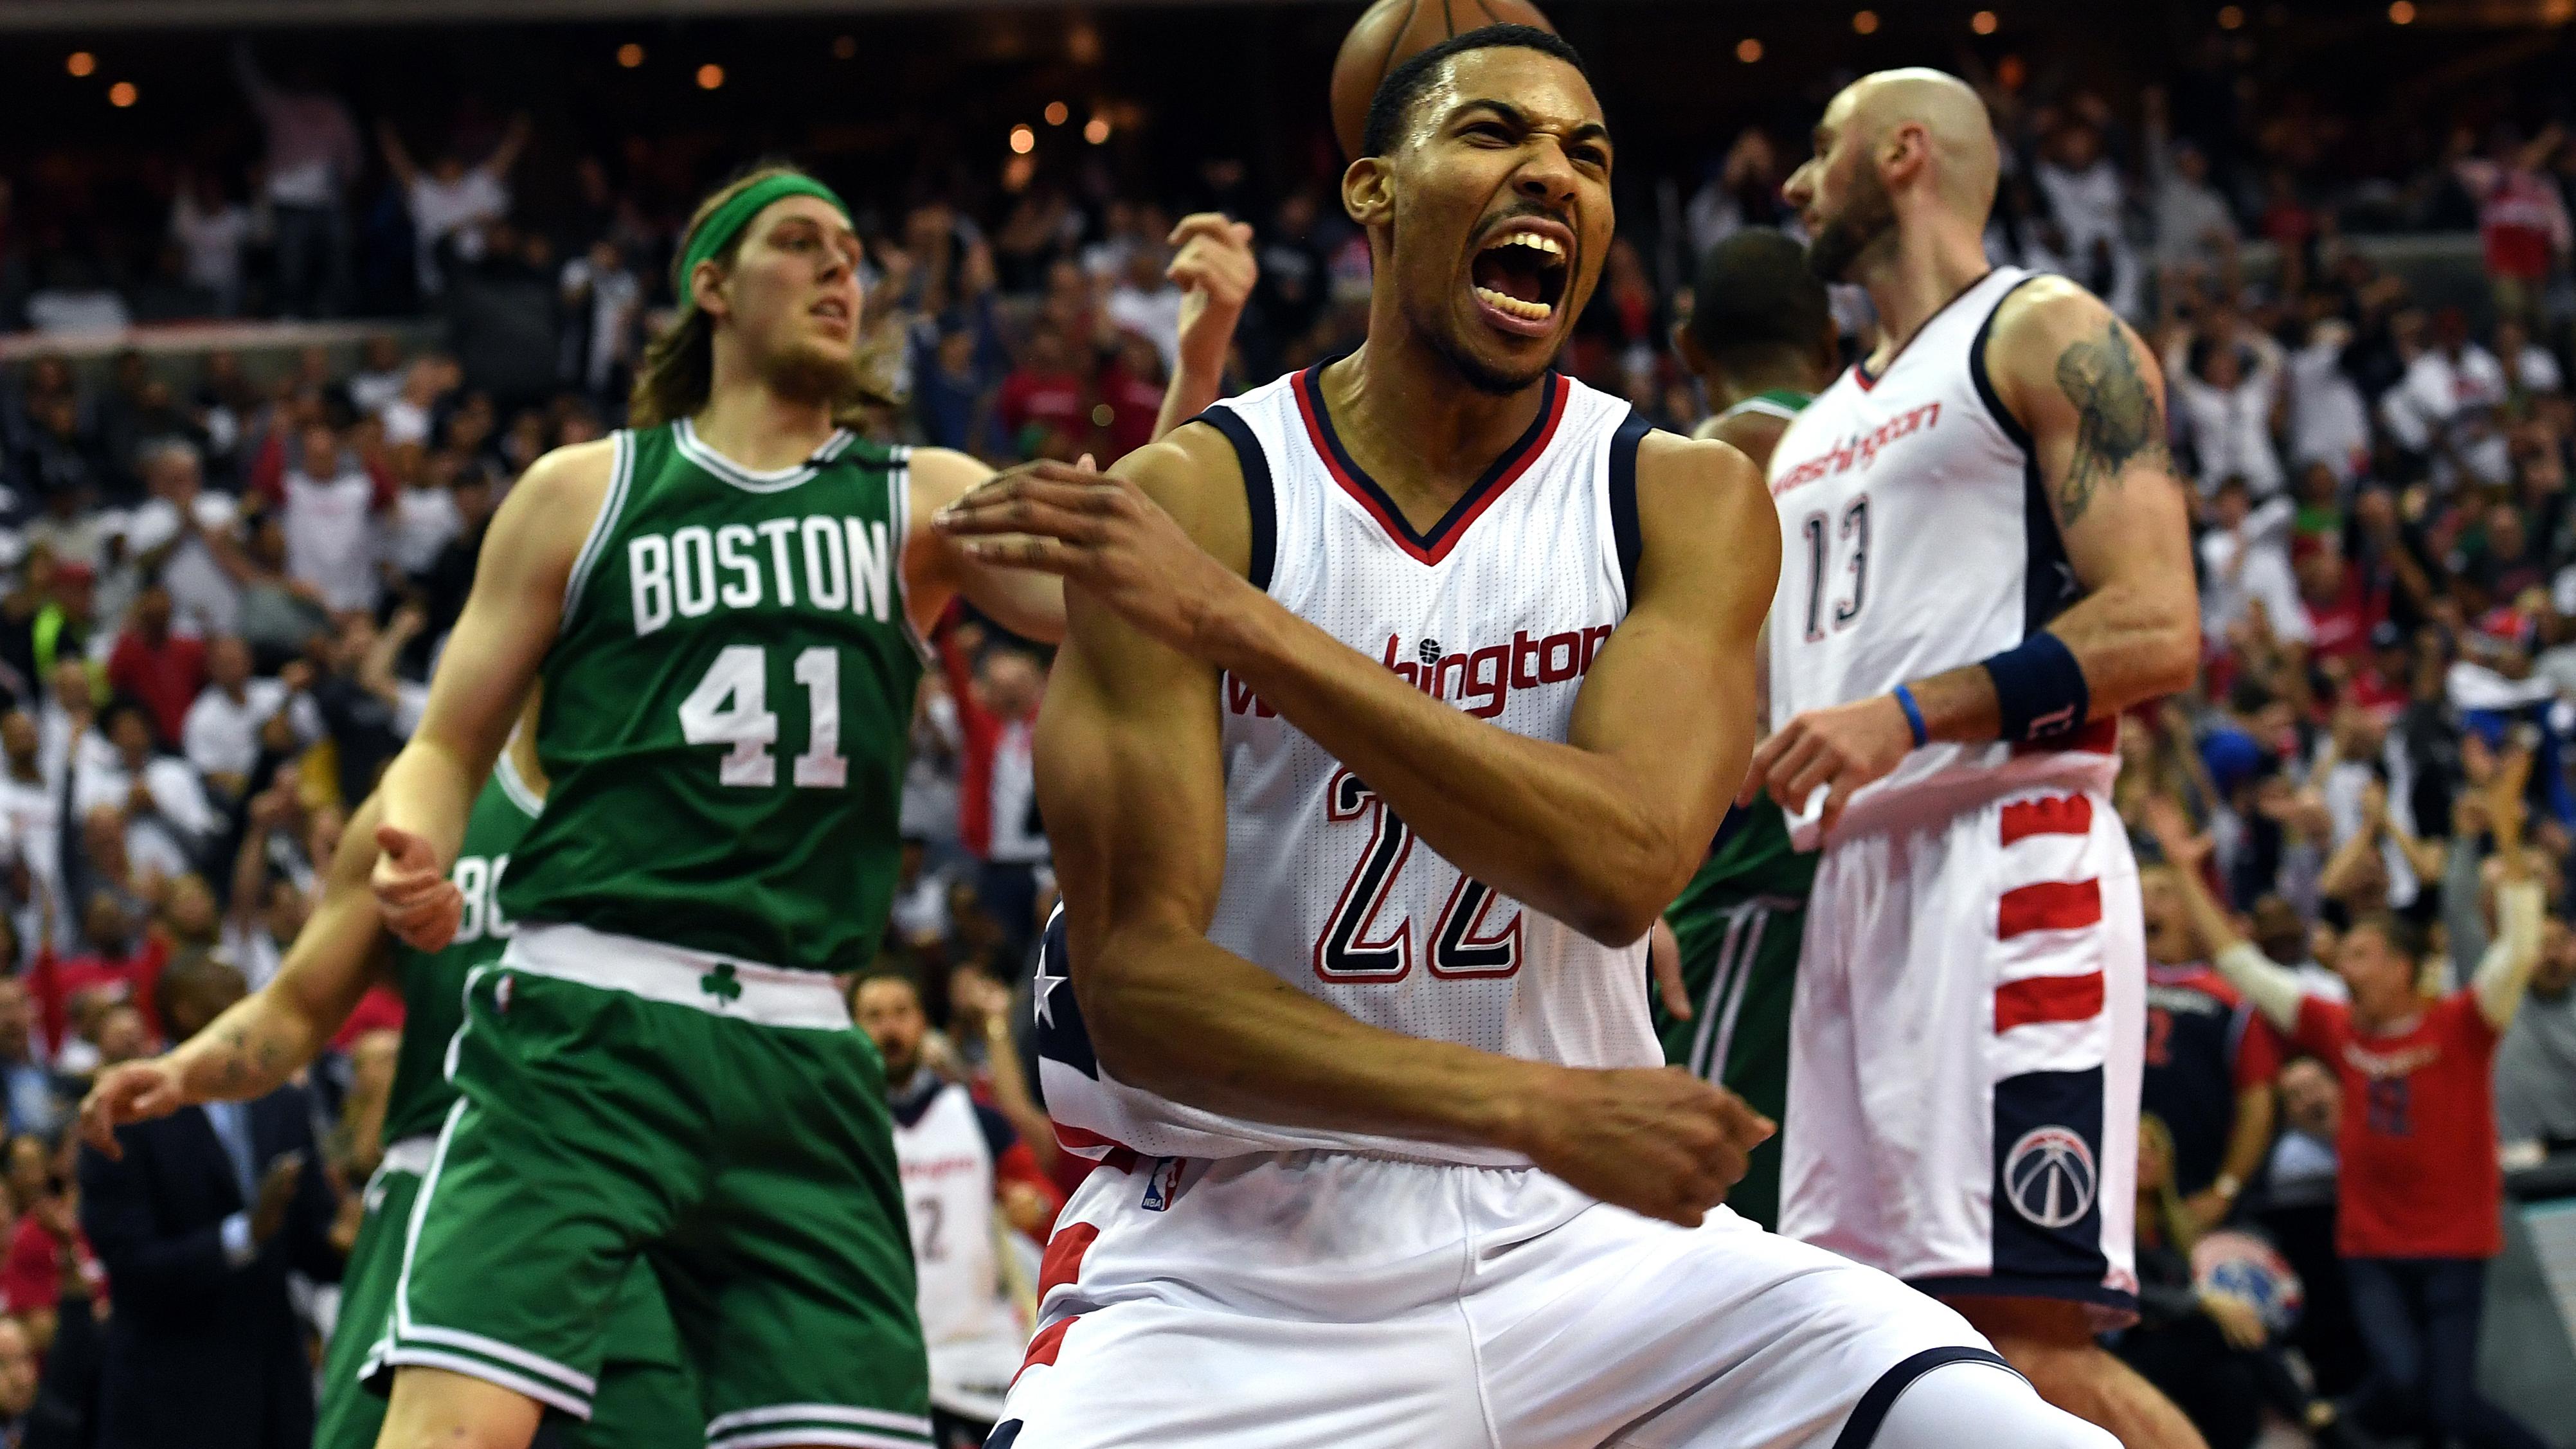 NBA Plyoffs: Washington Wizards vs Boston Celtics